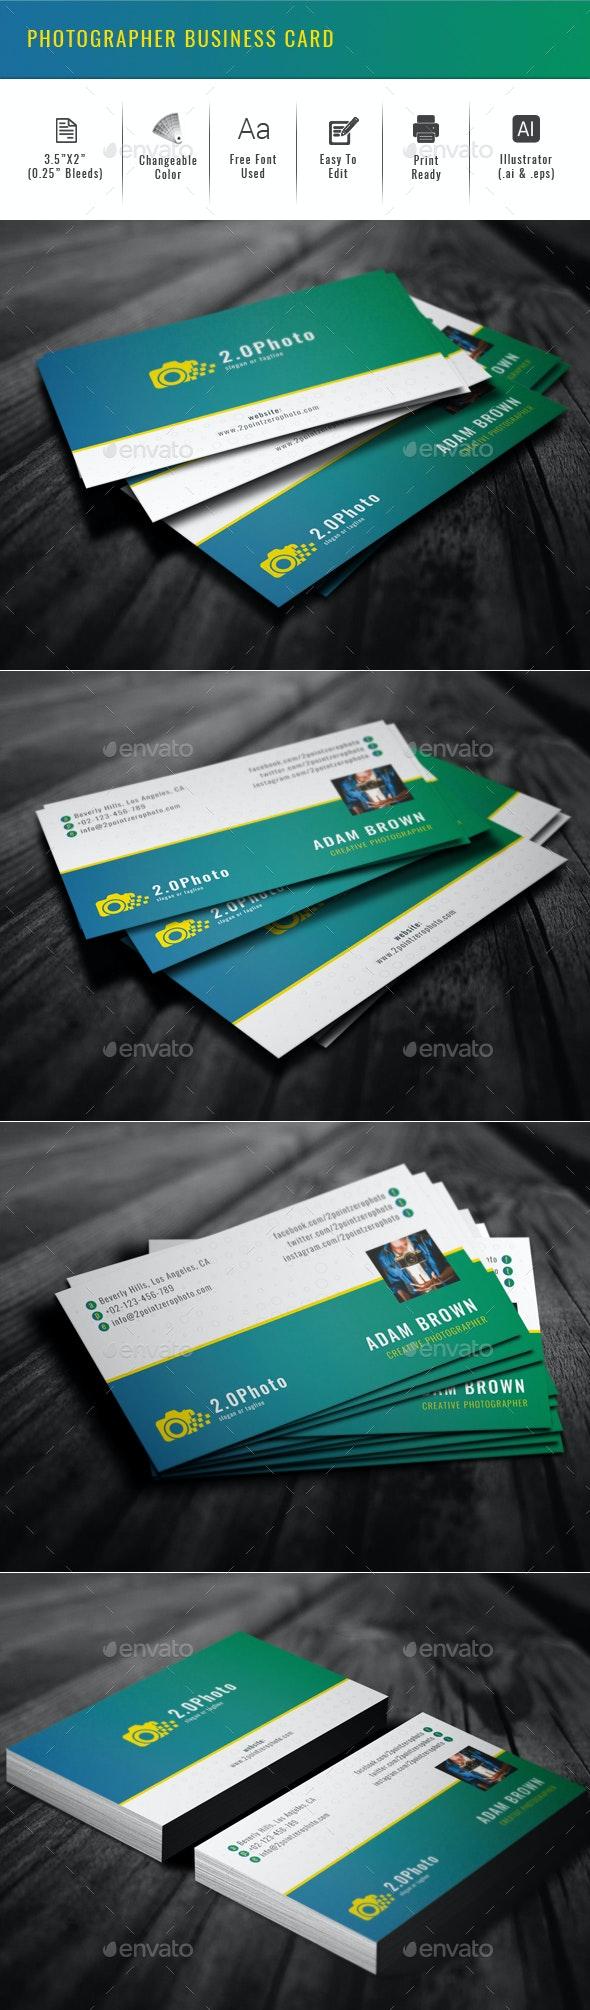 Photographer Business Card - Creative Business Cards